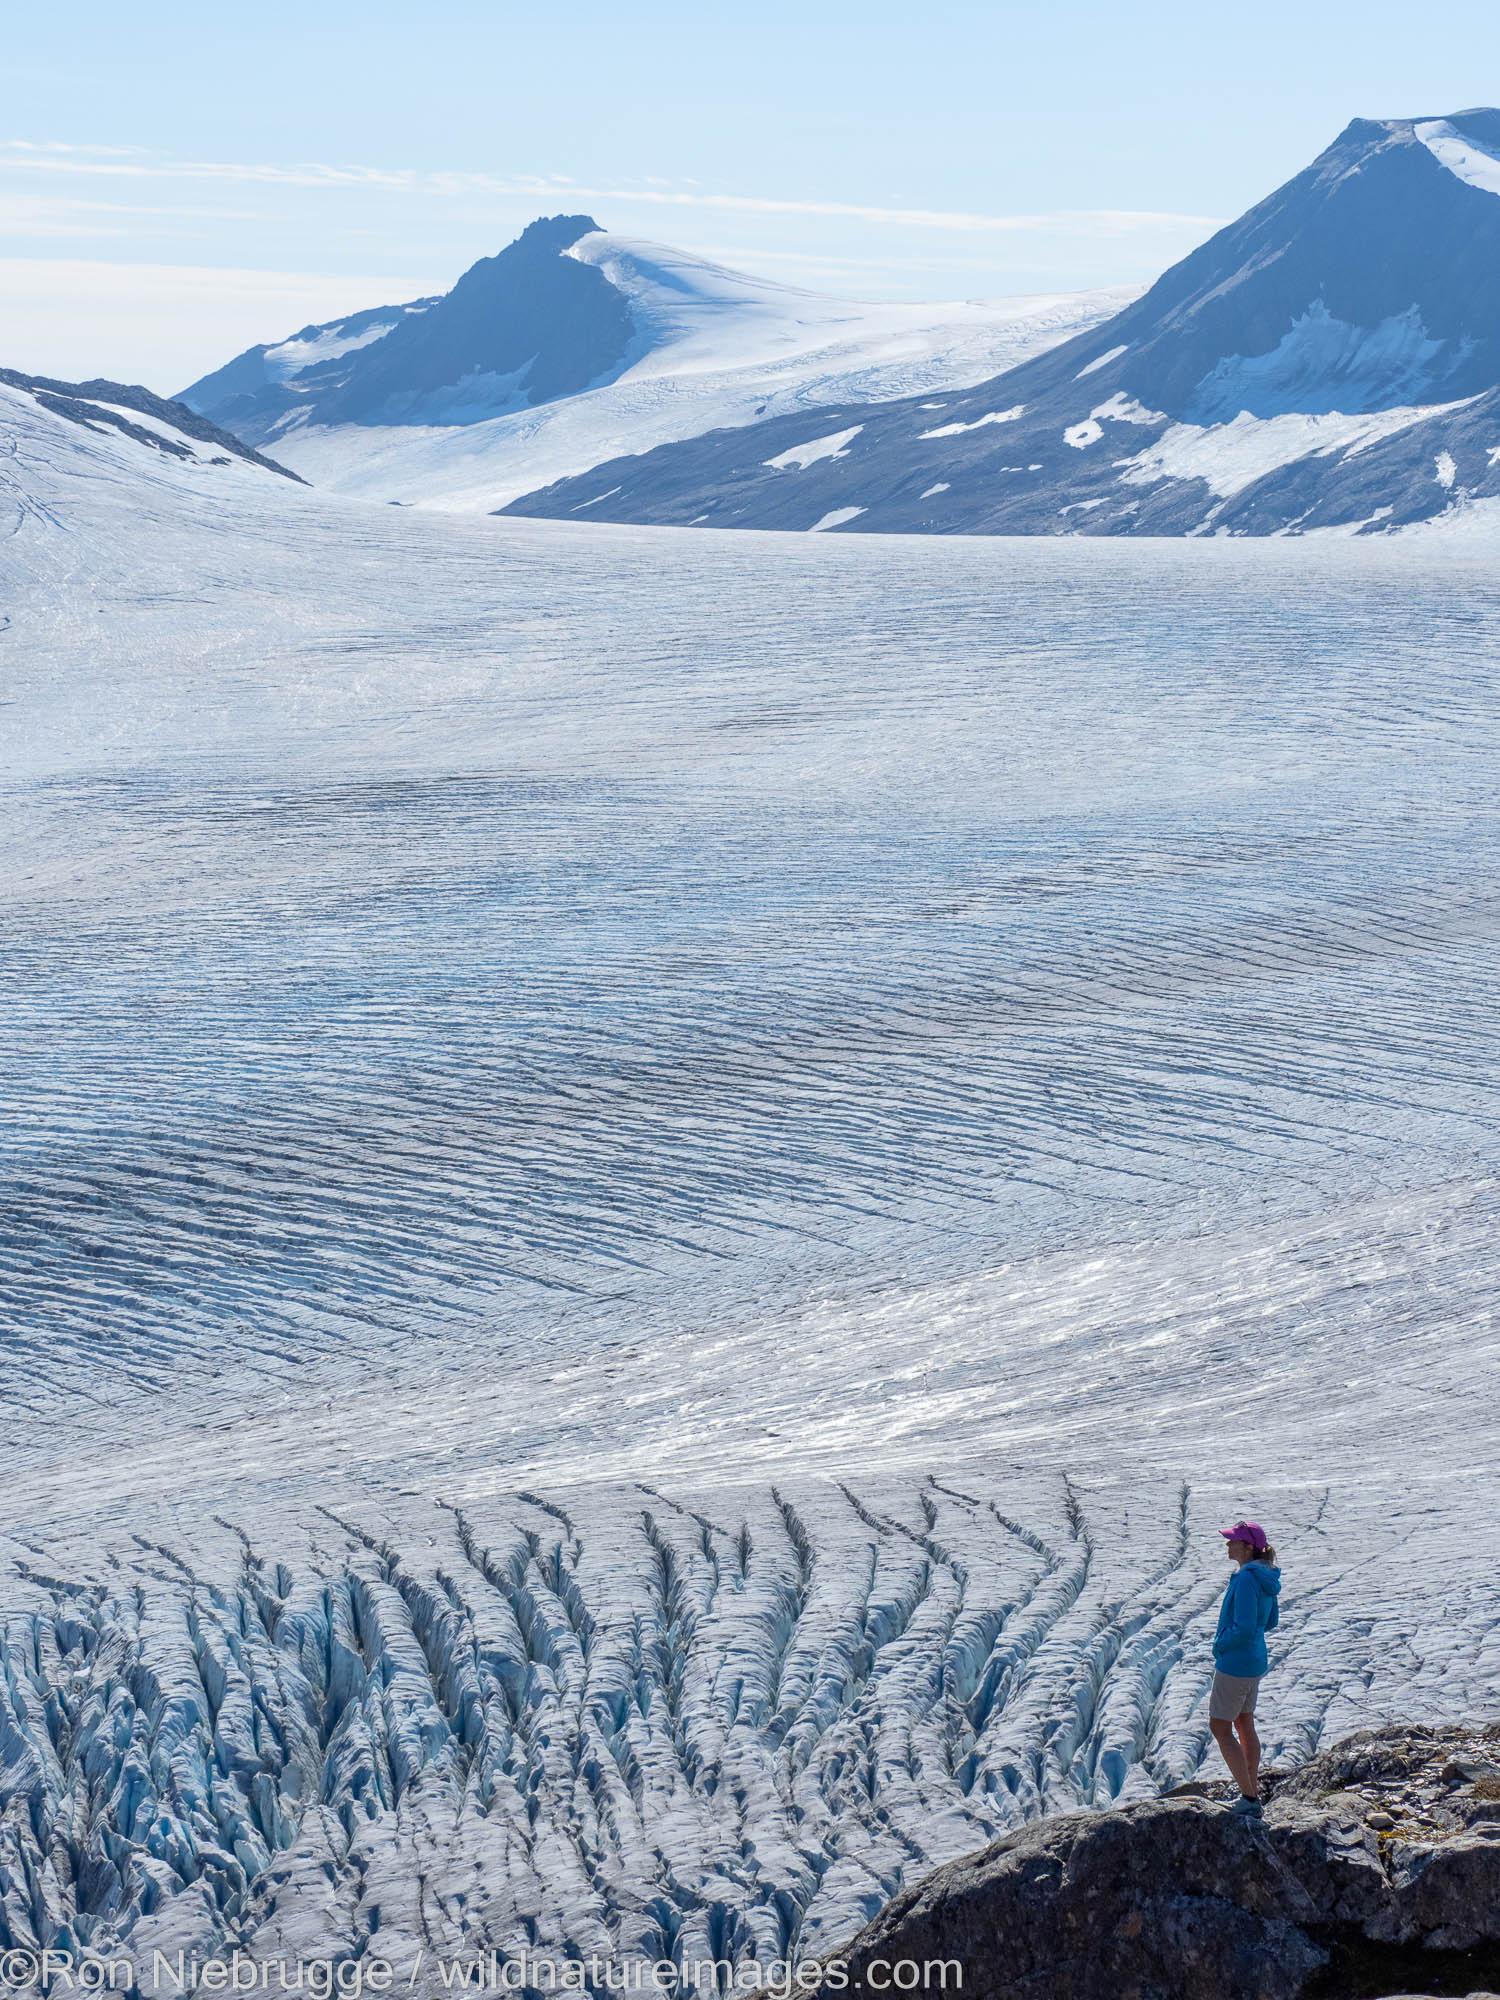 Hiker, Harding Icefield from Exit Glacier Trail, Kenai Fjords National Park, near Seward, Alaska.